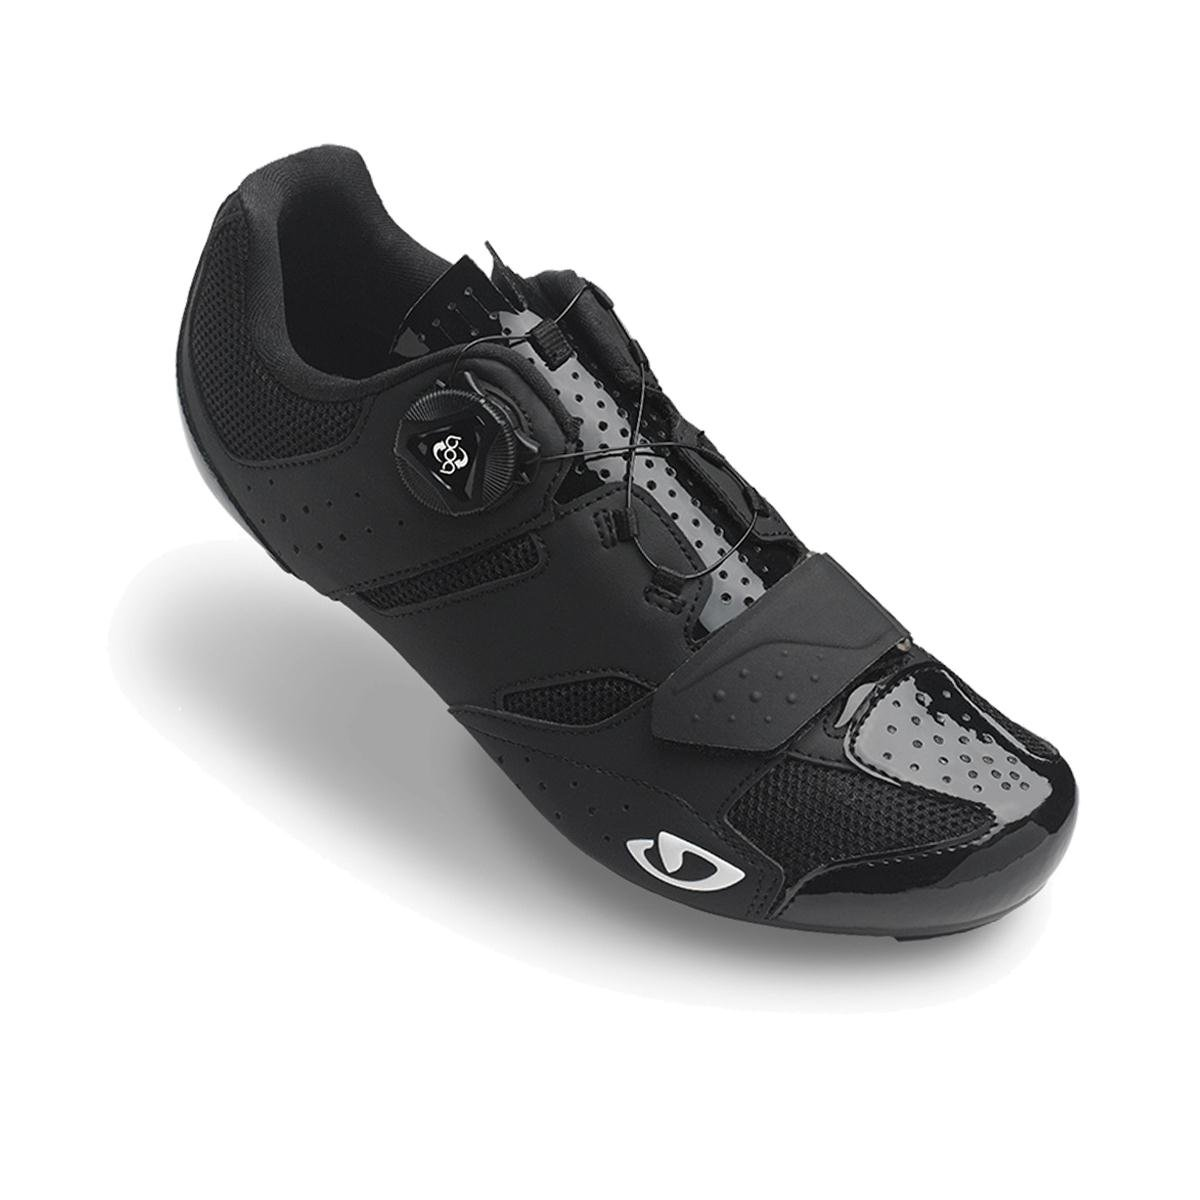 Giro savixサイクリング靴 – Women 's B01NCM9HLL 38 M EU|ブラック ブラック 38 M EU